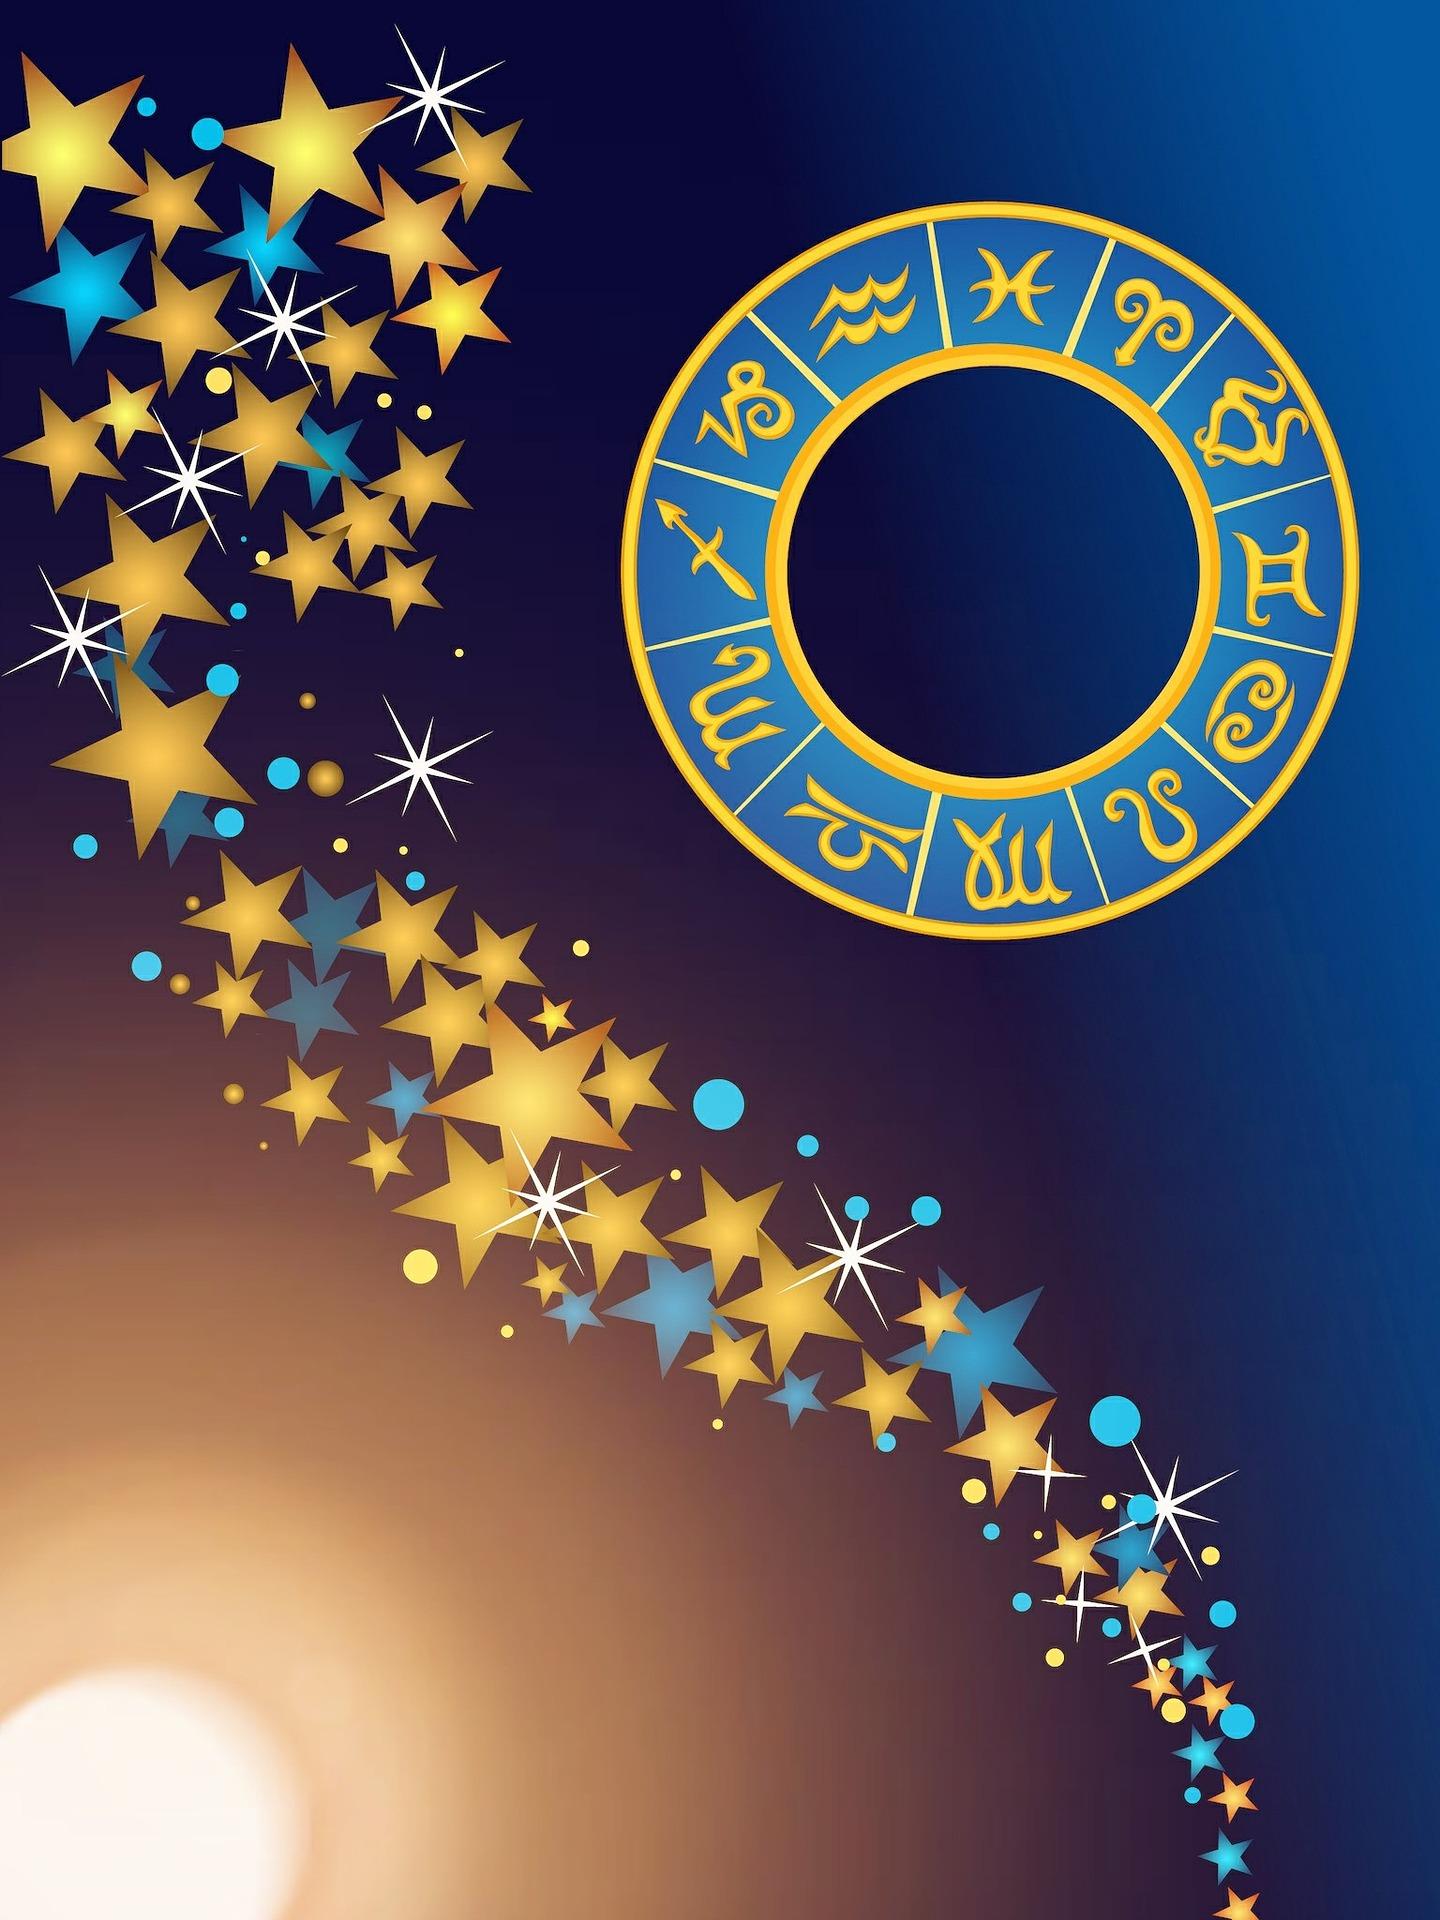 The Age of Aquarius is now!